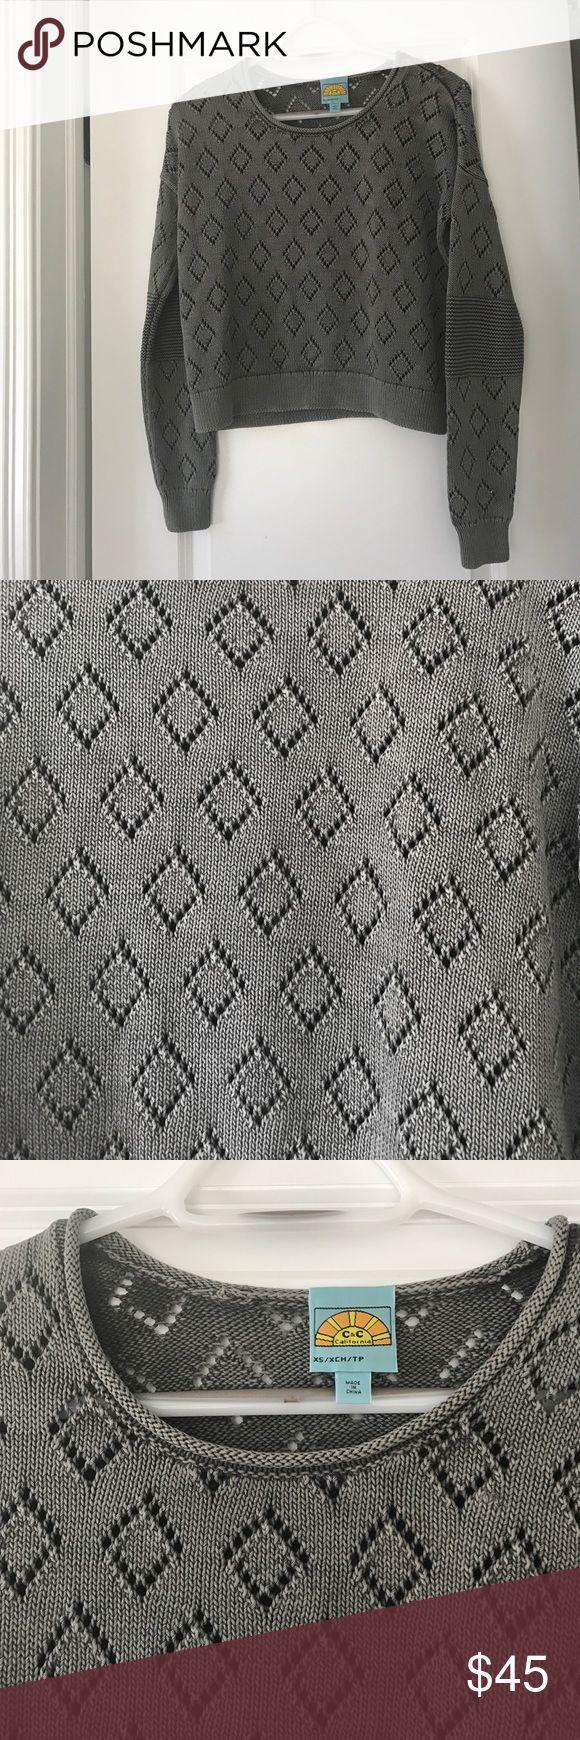 C&C California Sweater Size XS. No flaws. C&C California Sweaters Crew & Scoop Necks